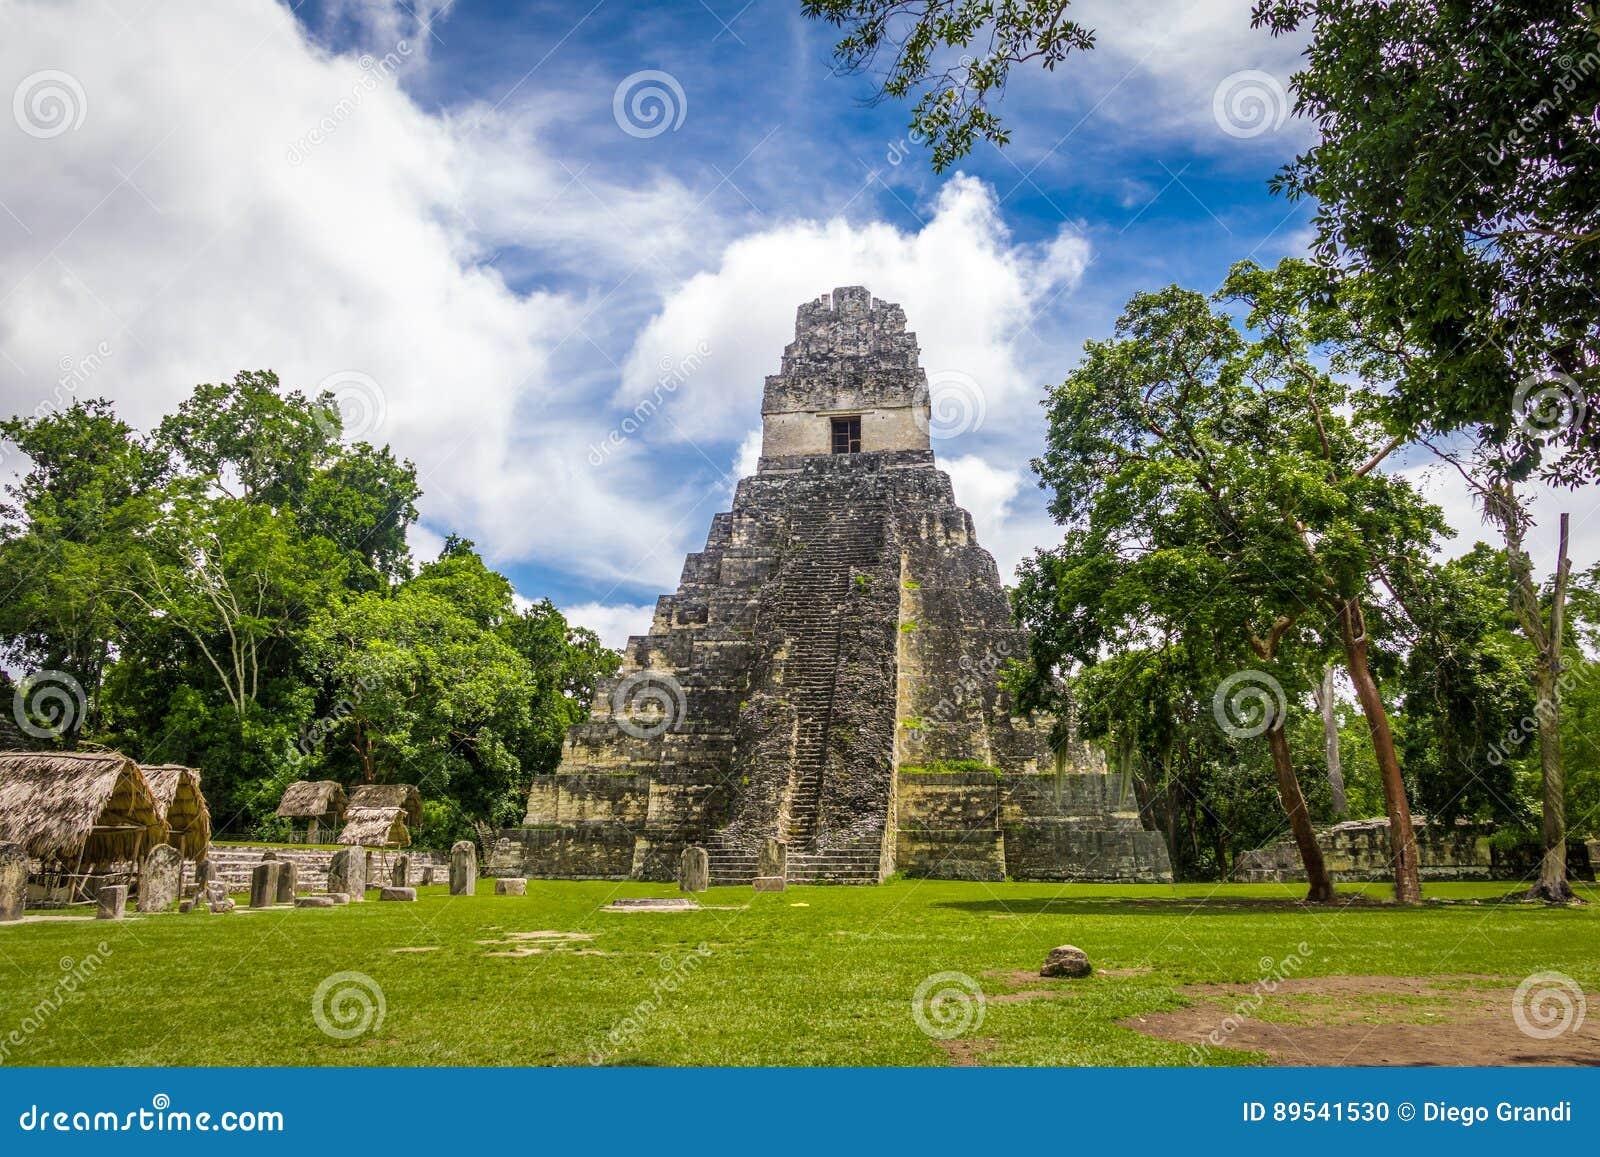 Mayan Tempel I Gran Jaguar bij het Nationale Park van Tikal - Guatemala